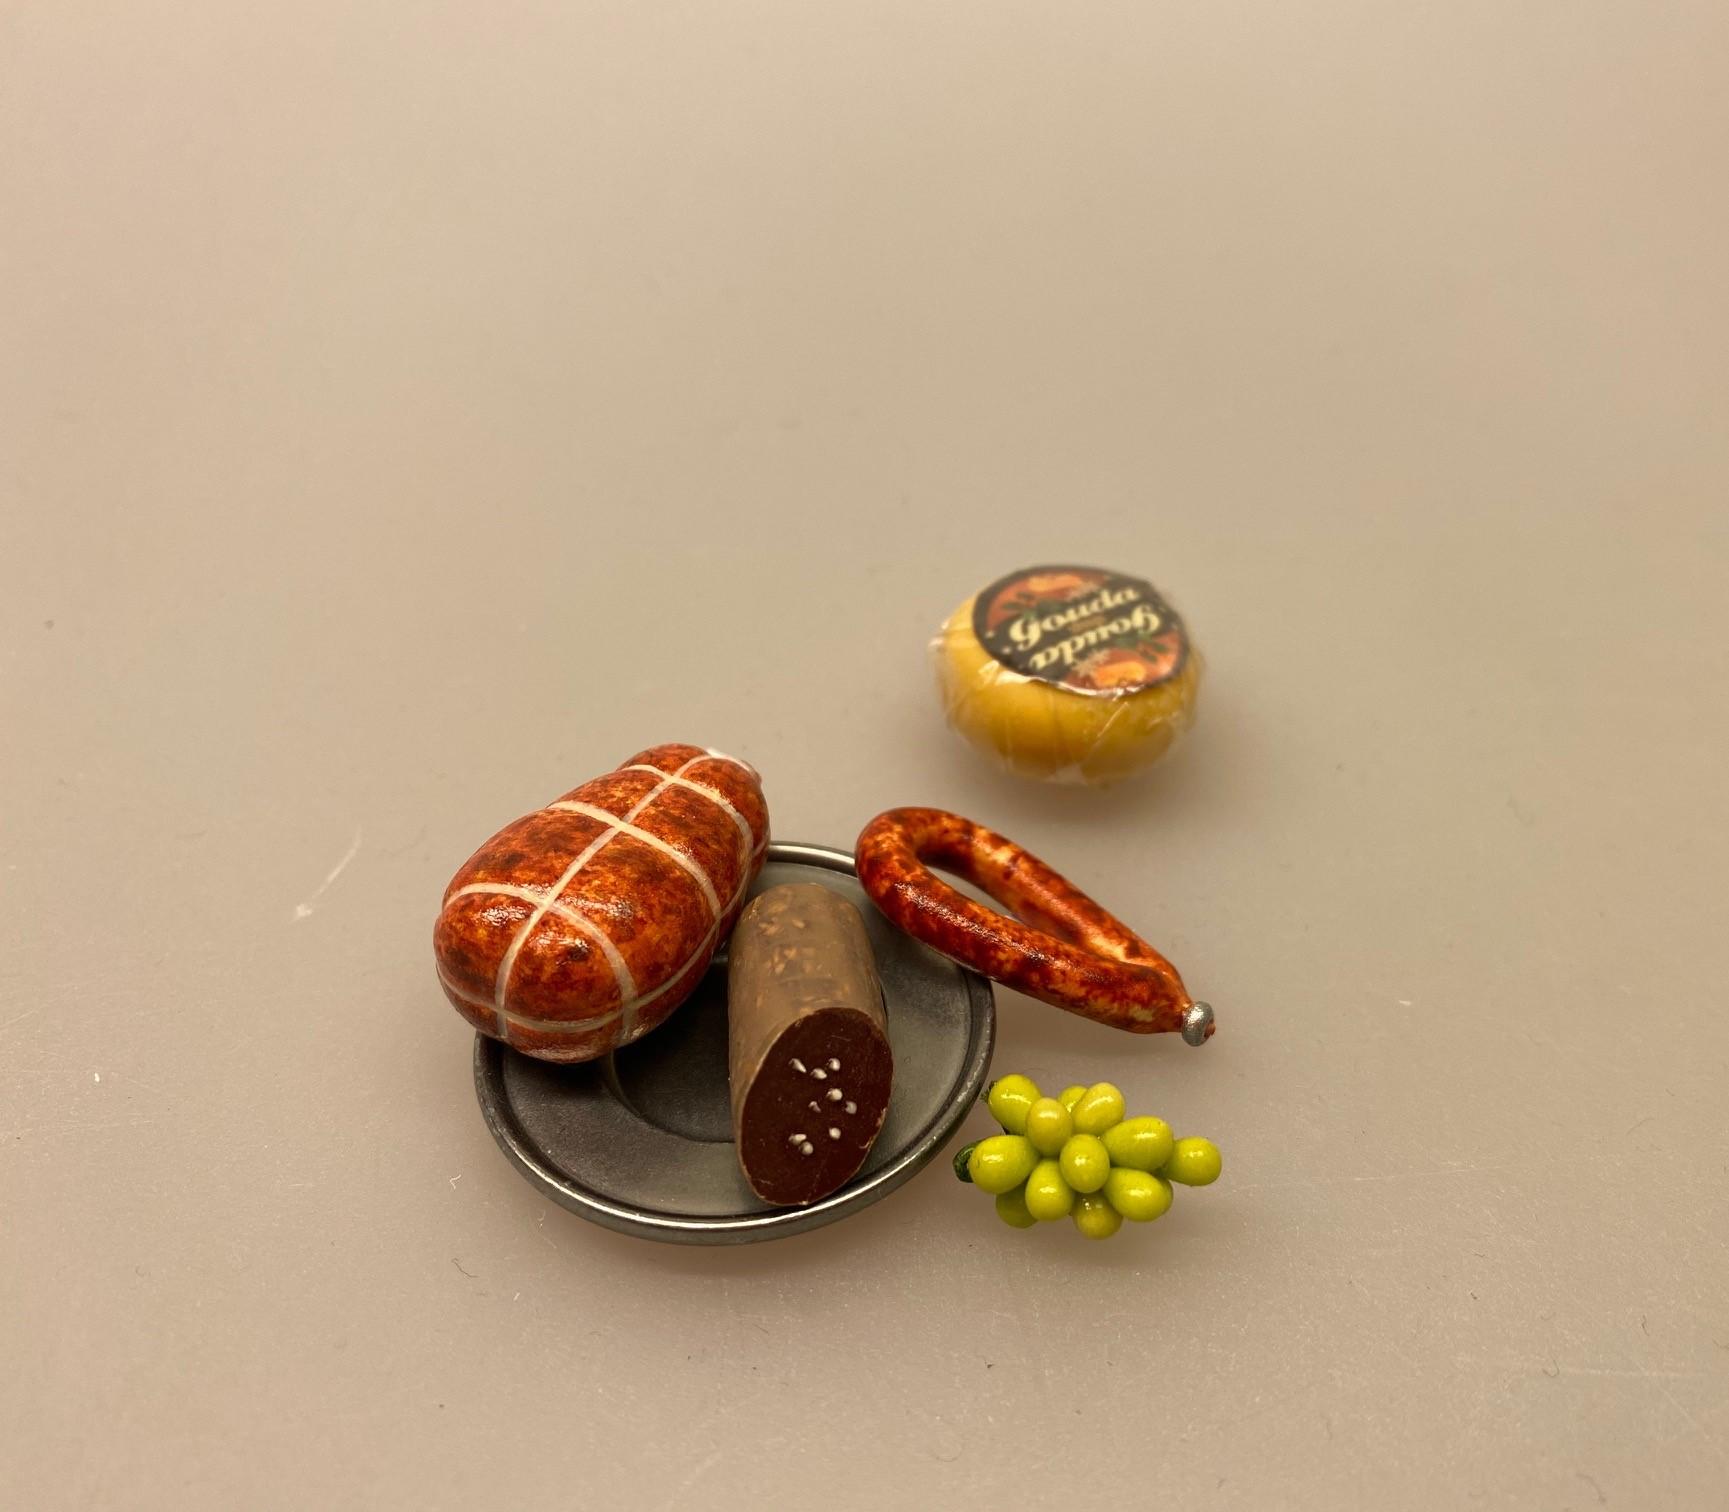 Miniature rund pølse 1:12 ,Miniature røget skinke 1:12, Miniature Gouda ost, ost, ostebord, gauda, rund ost, købmandsbutik, købmandsvarer, mini, miniature, miniaturer, gammel, gamle, dukkehusting, dukkehuset, ting til, interiør, mad, dukkemad, legemad, sætterkassen, sættekasseting, model, legemad, biti, ribe, 1:12